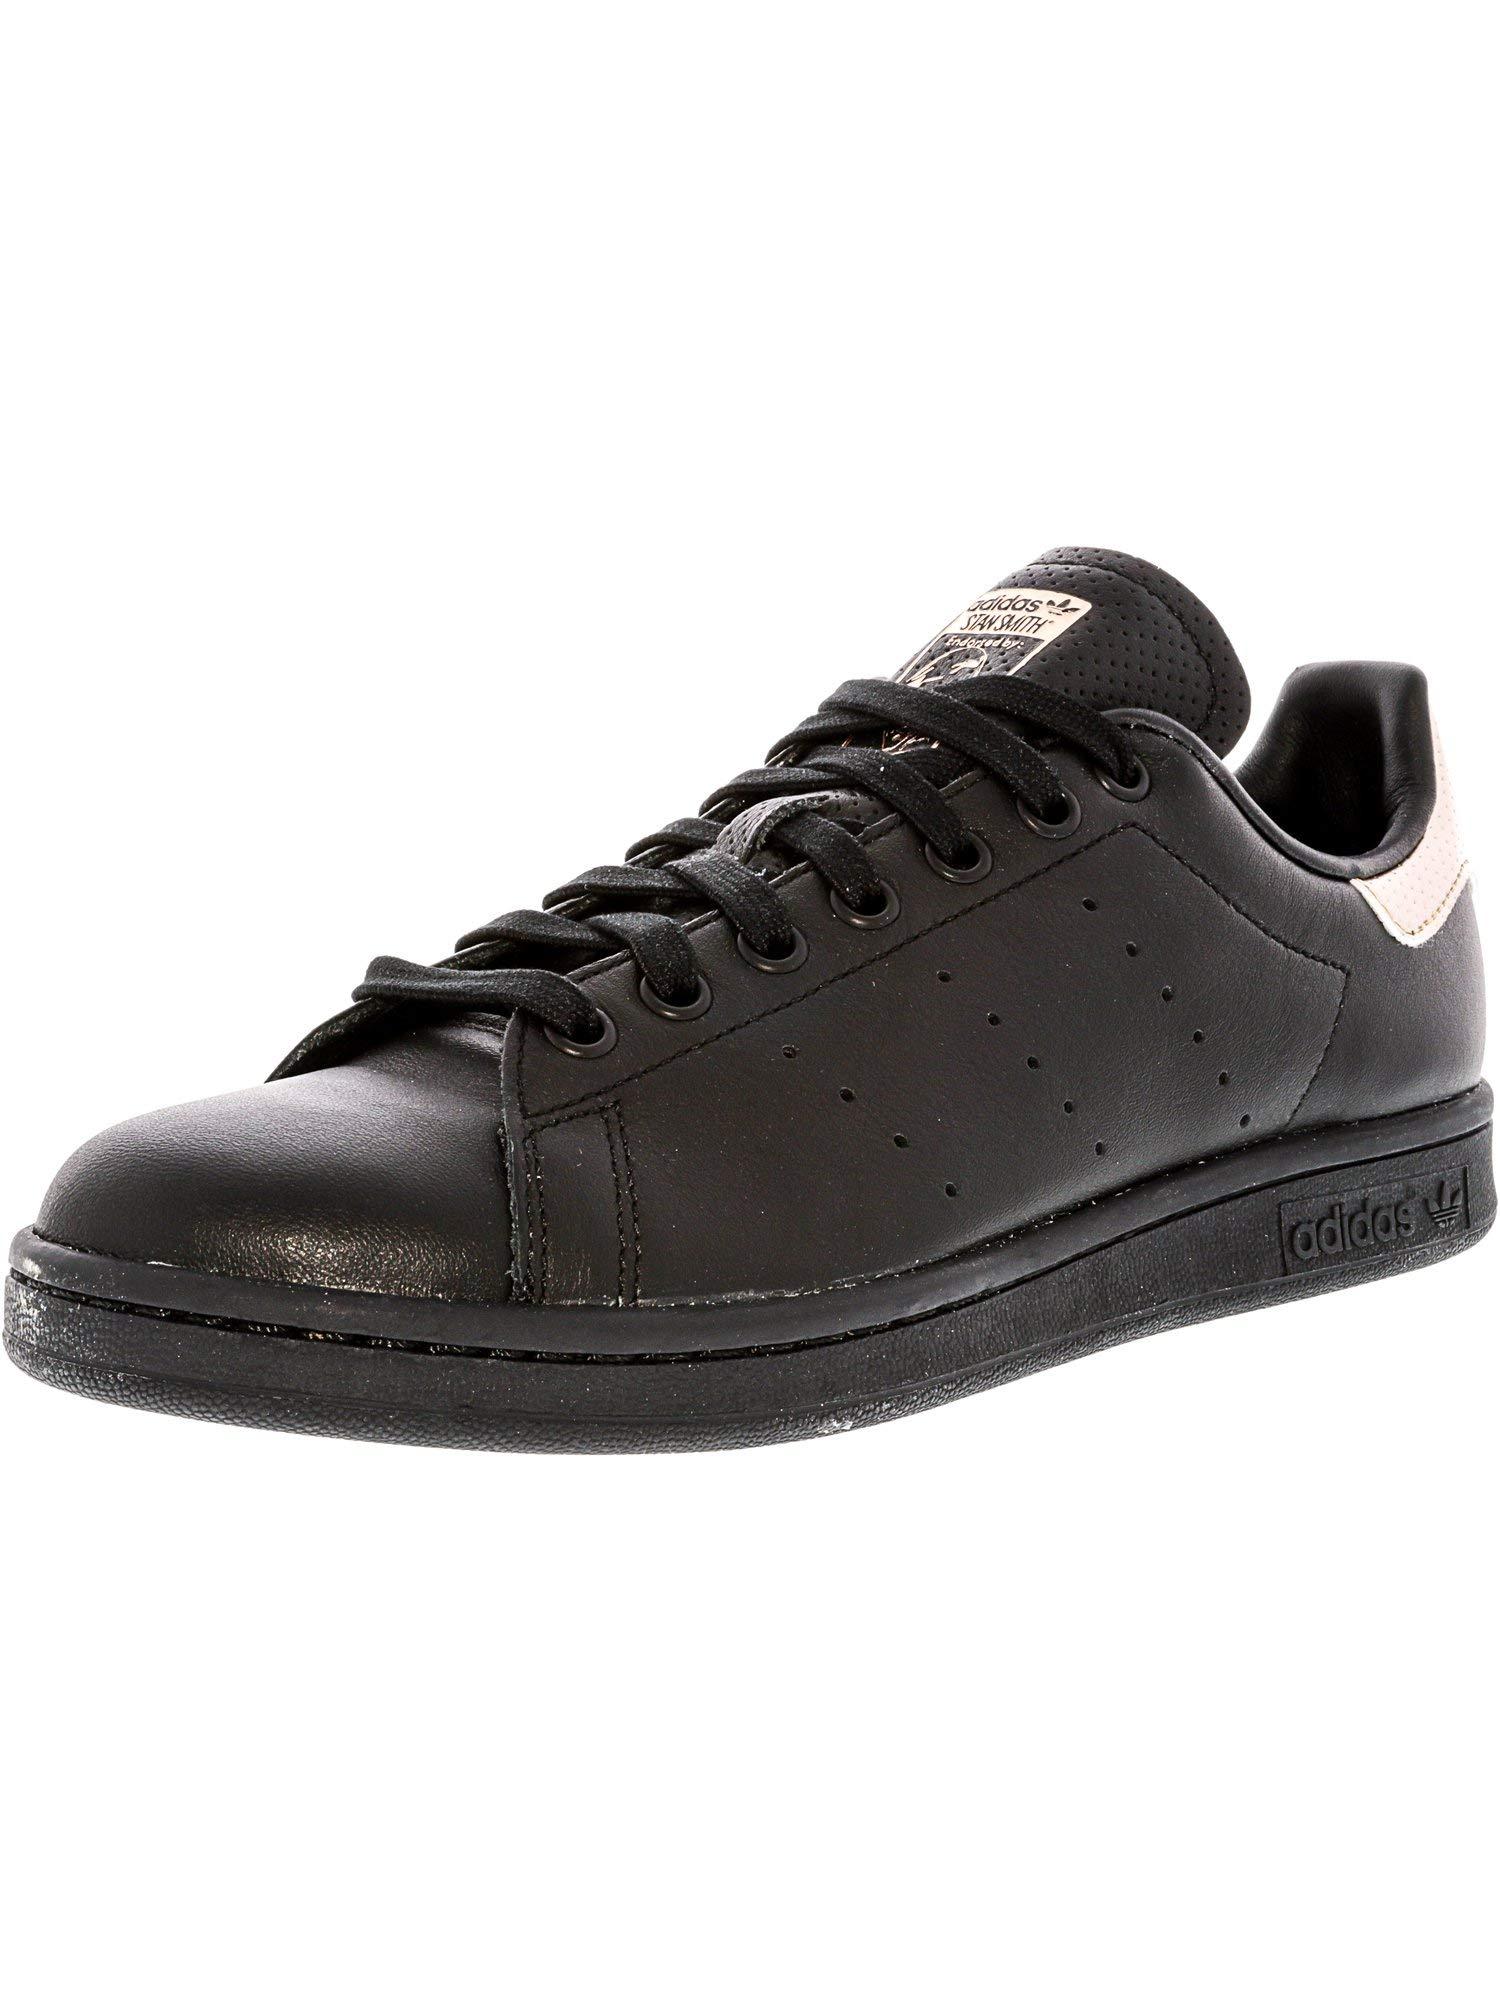 uk availability ec899 1fcc4 Galleon - Adidas Originals Women s Stan Smith W Fashion Skateboarding  Sneaker, Black Rose Gold Black, 7.5 M US